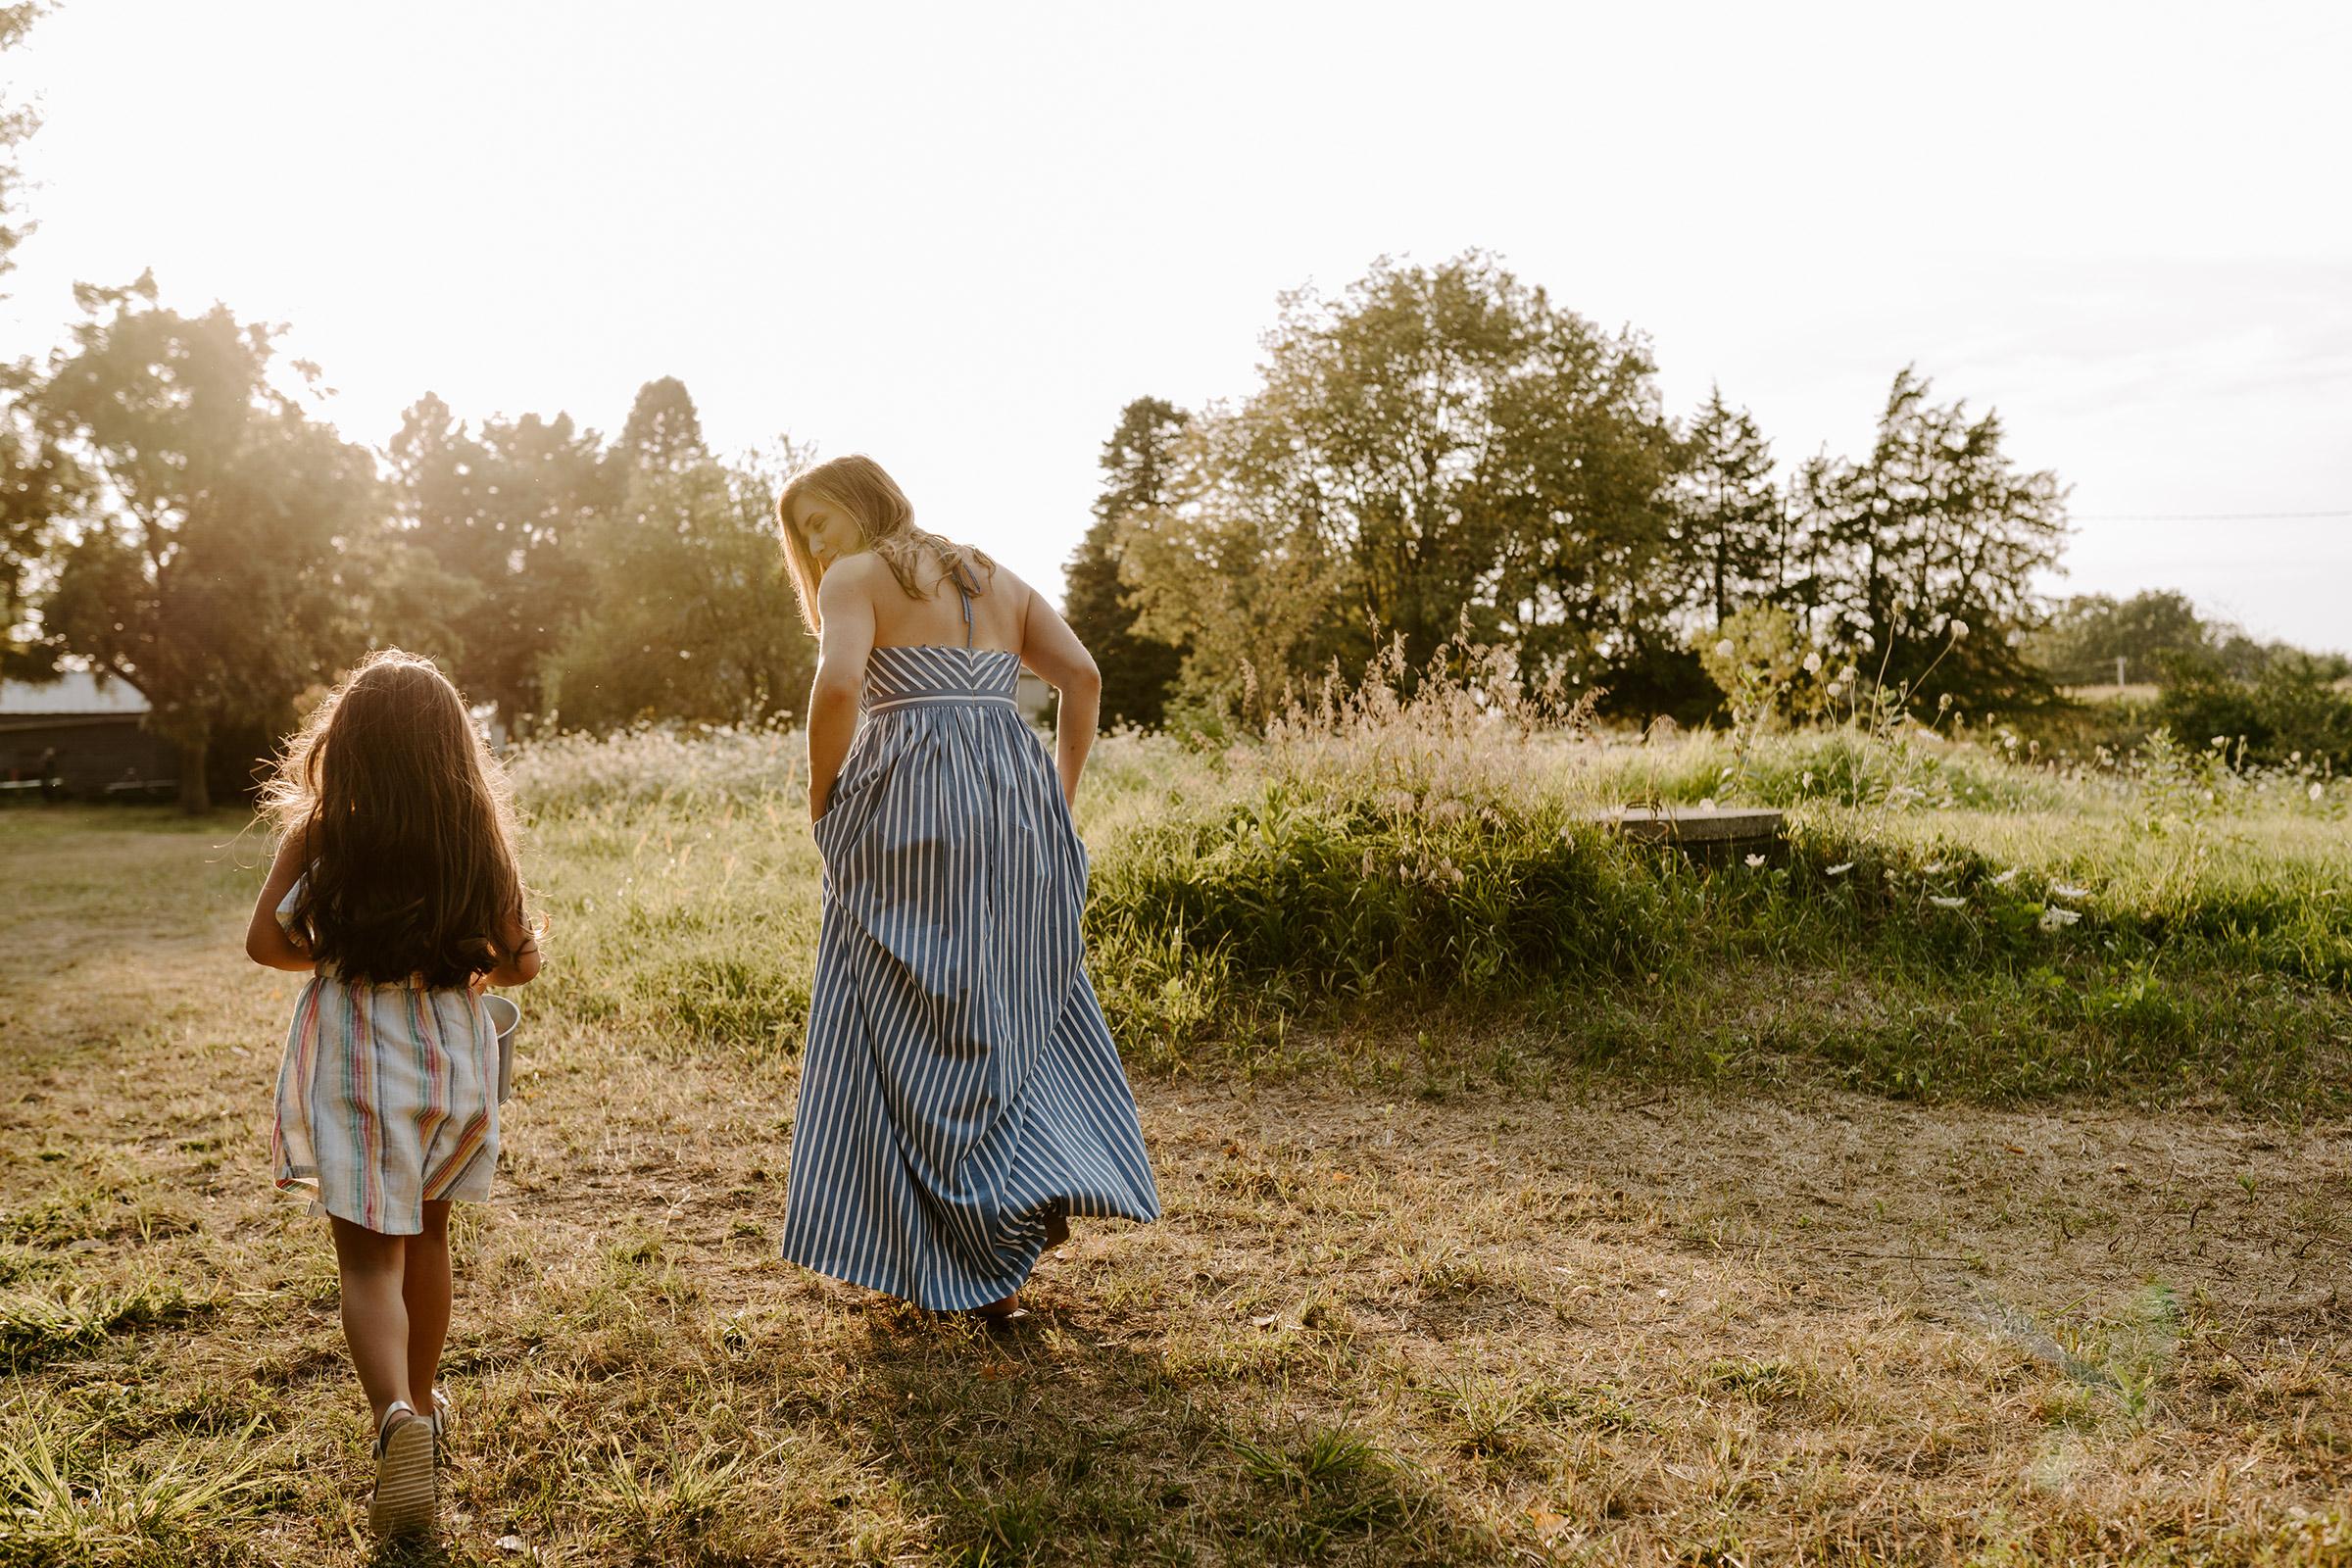 natale-family-mom-running-with-daughter-iris-aisle--winterset-iowa-raelyn-ramey-photography-117.jpg